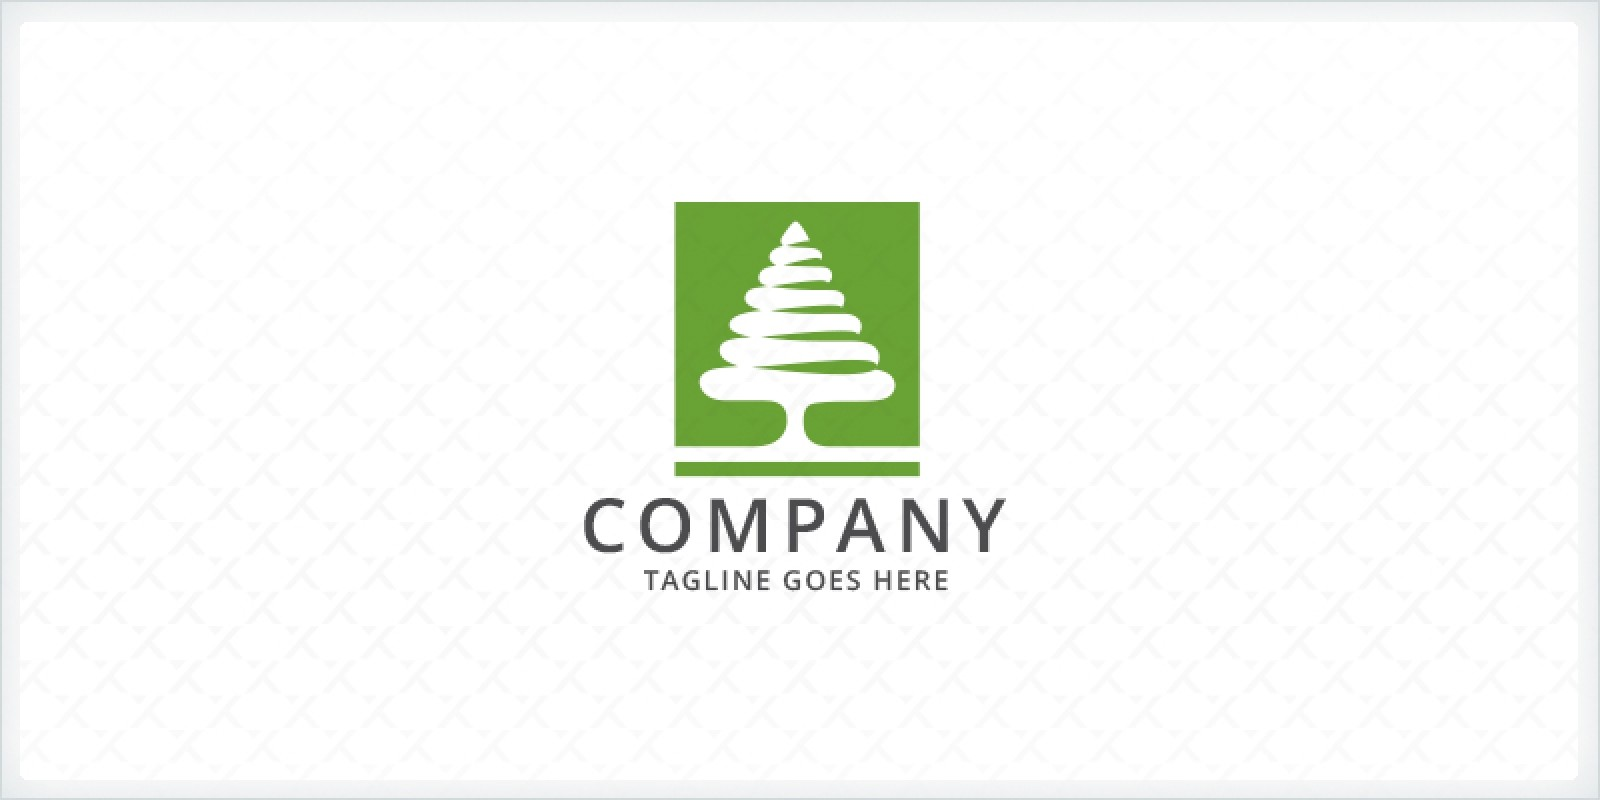 Green Pine Tree Logo